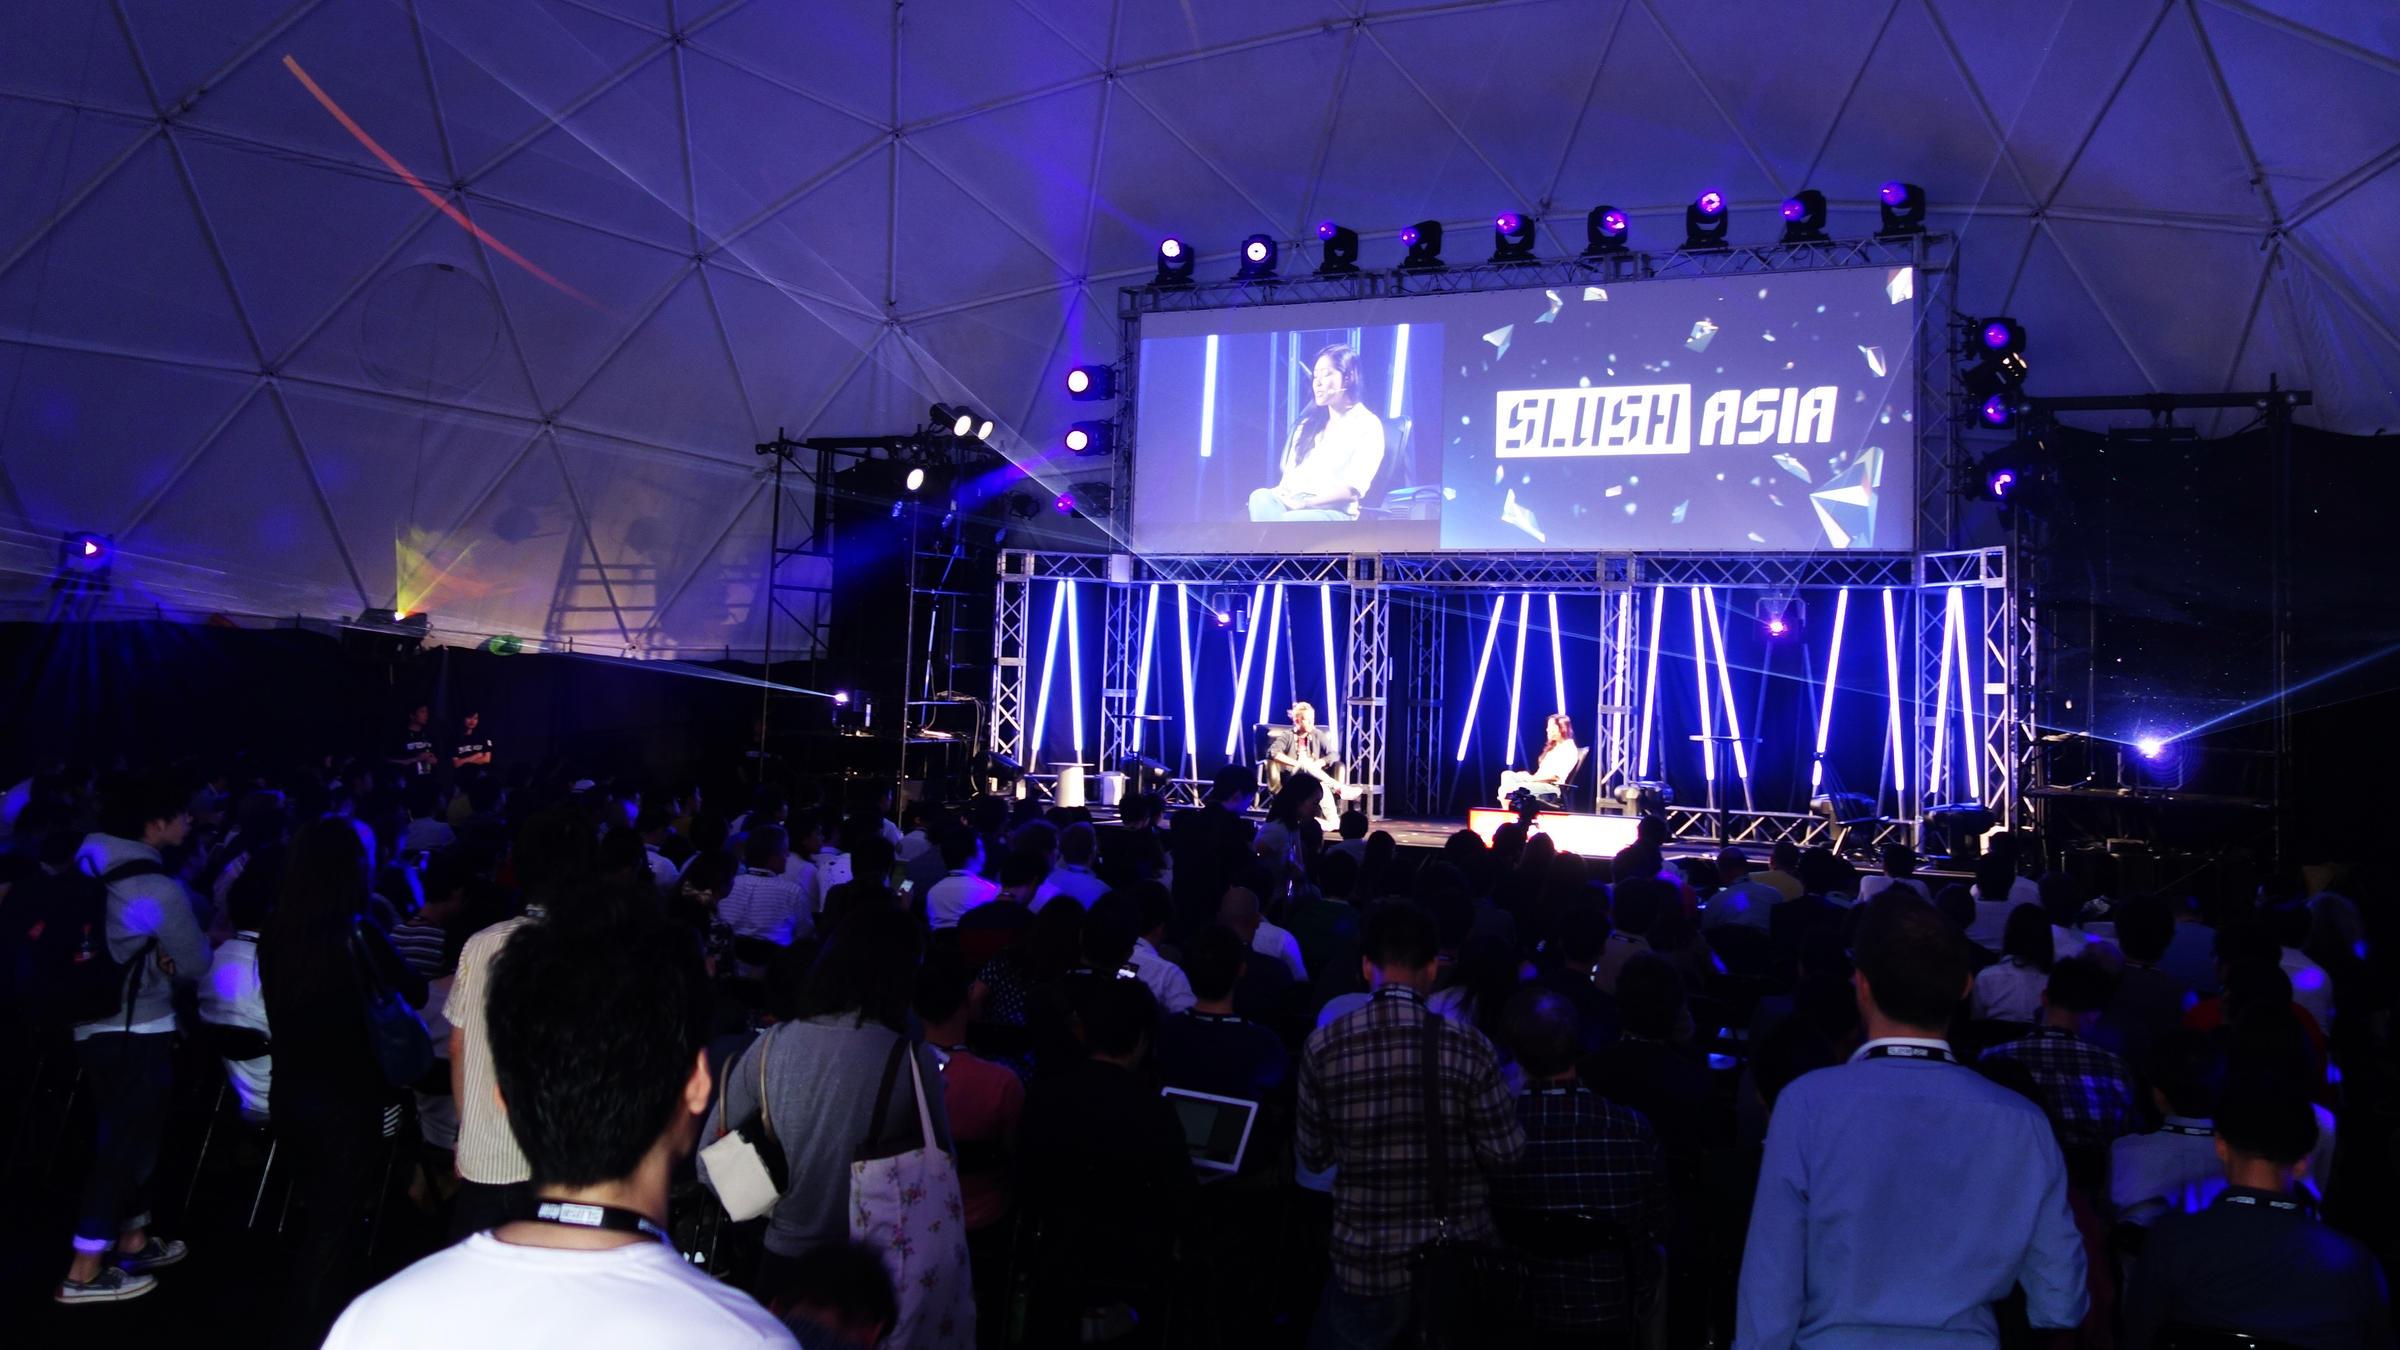 news technology anonymity goal japans online social scene